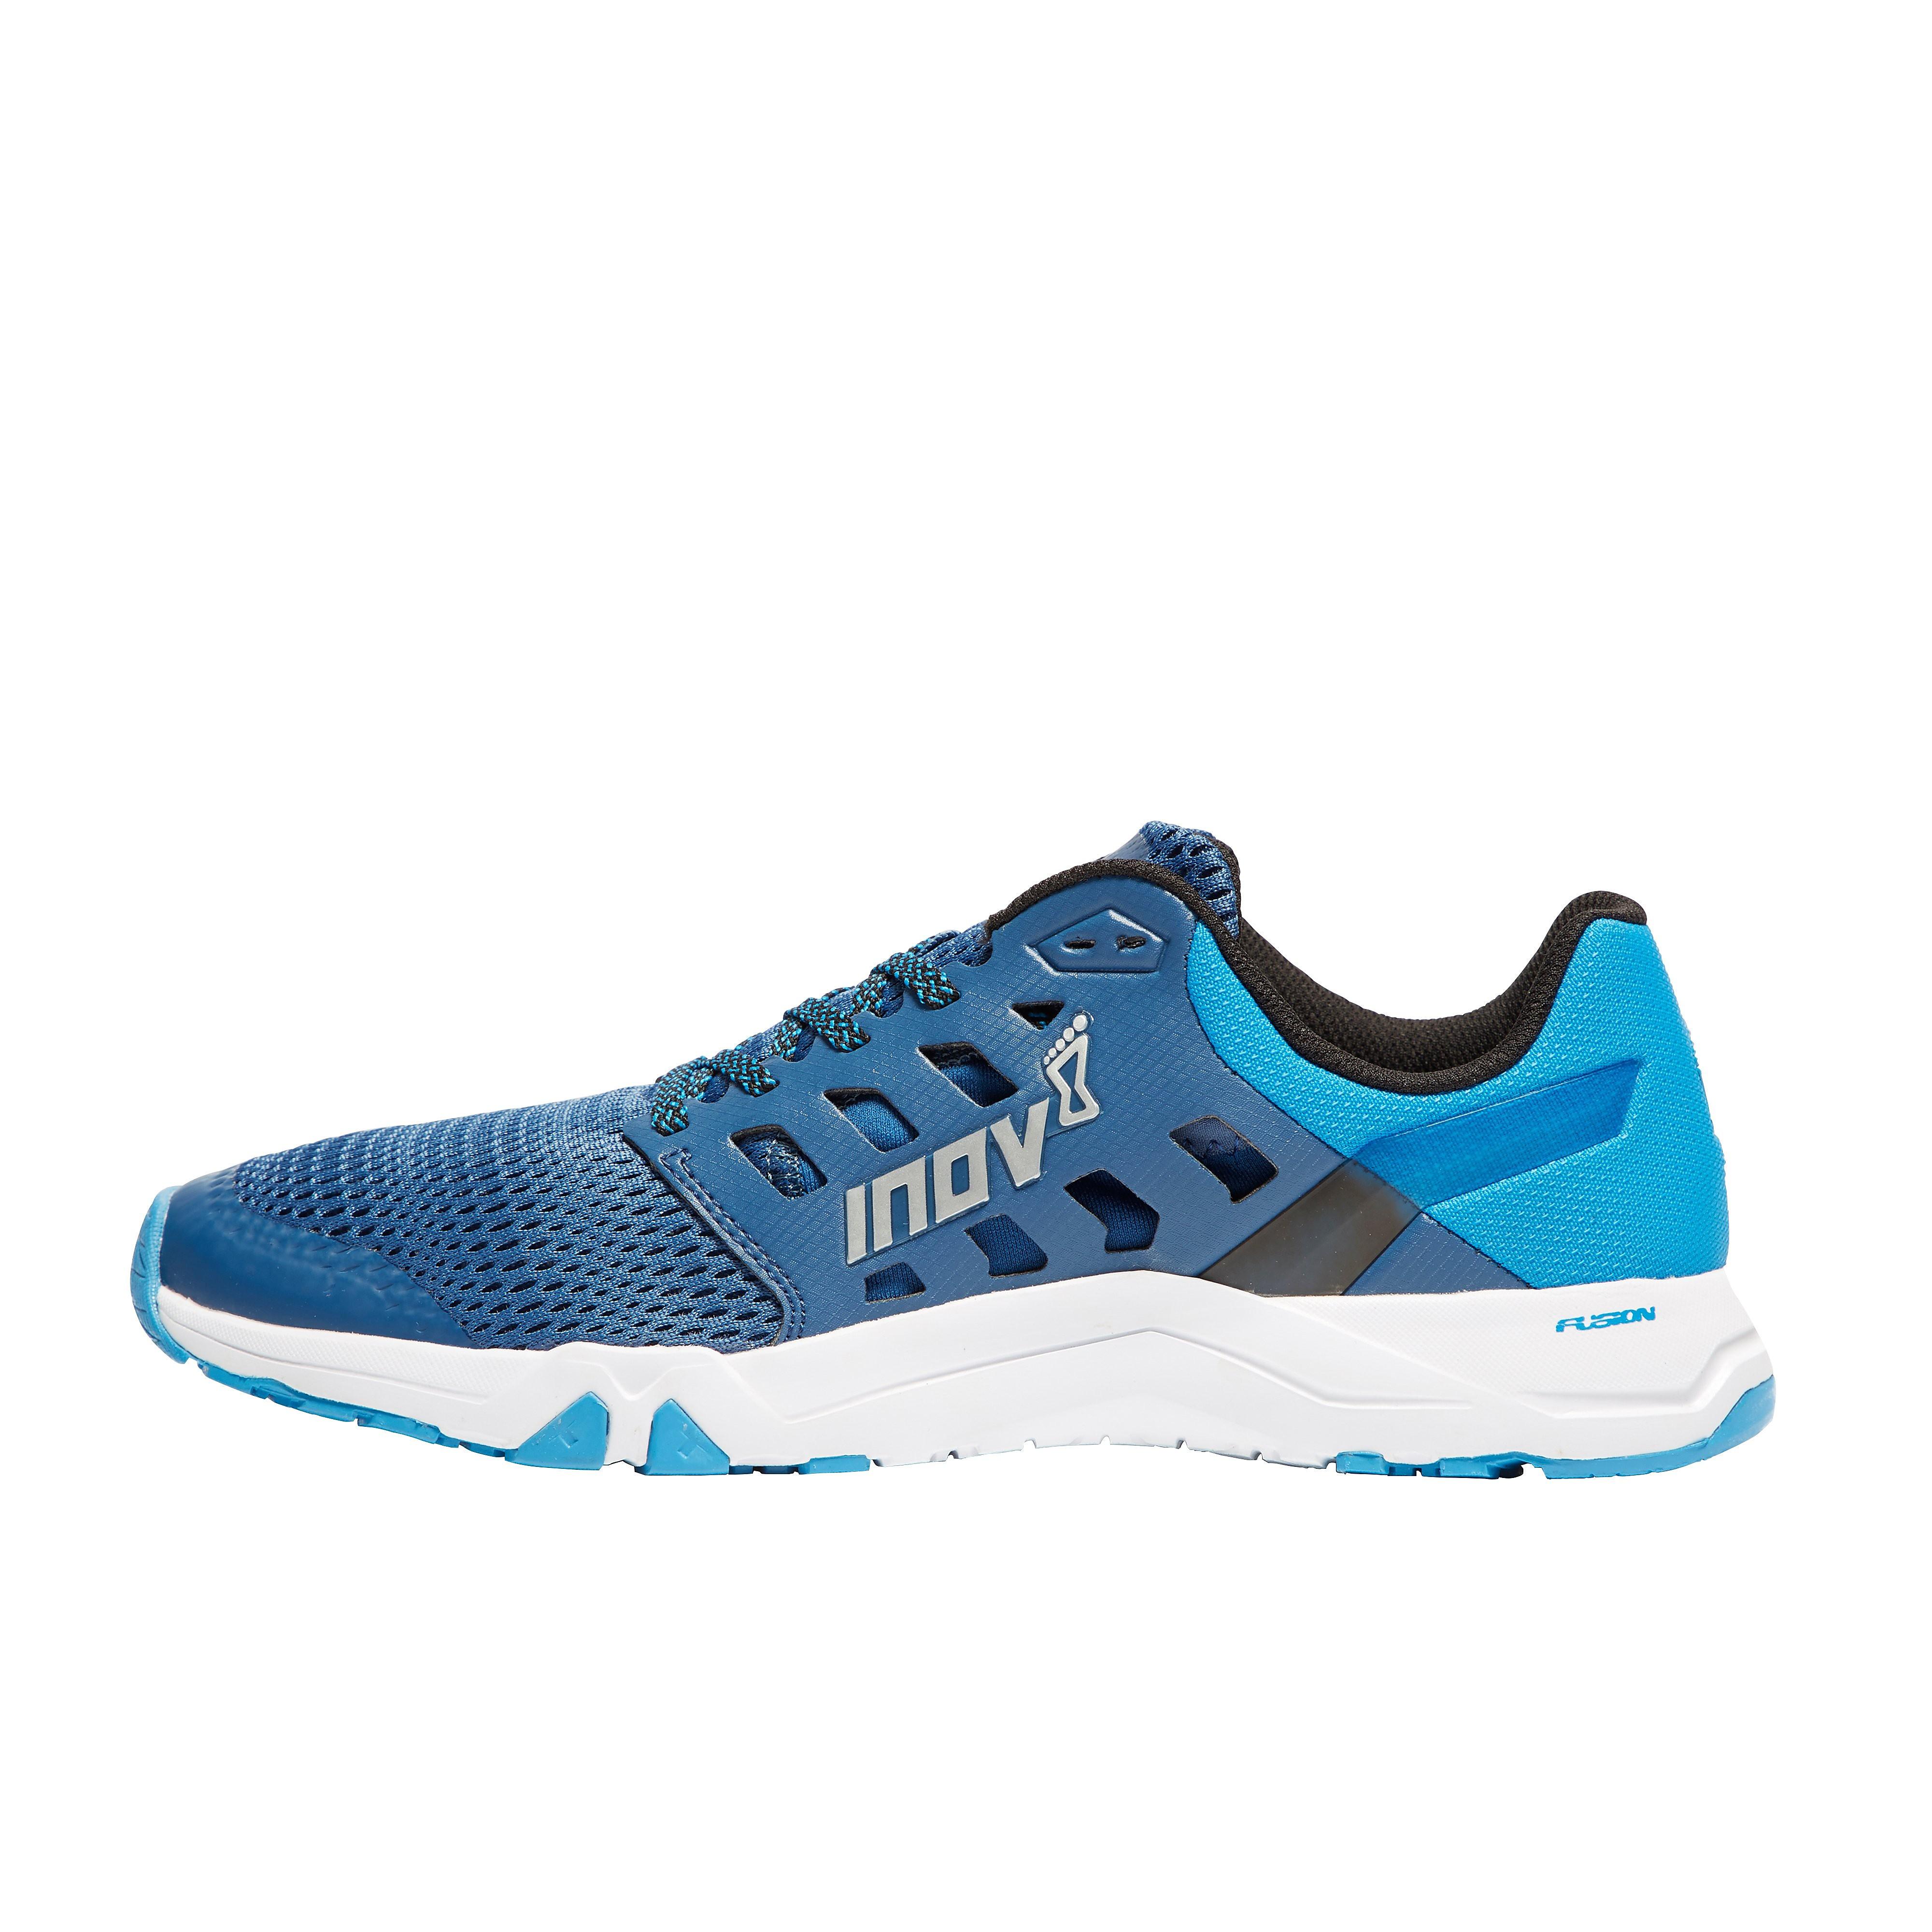 Inov-8 All Train 215 Men's Running Shoes